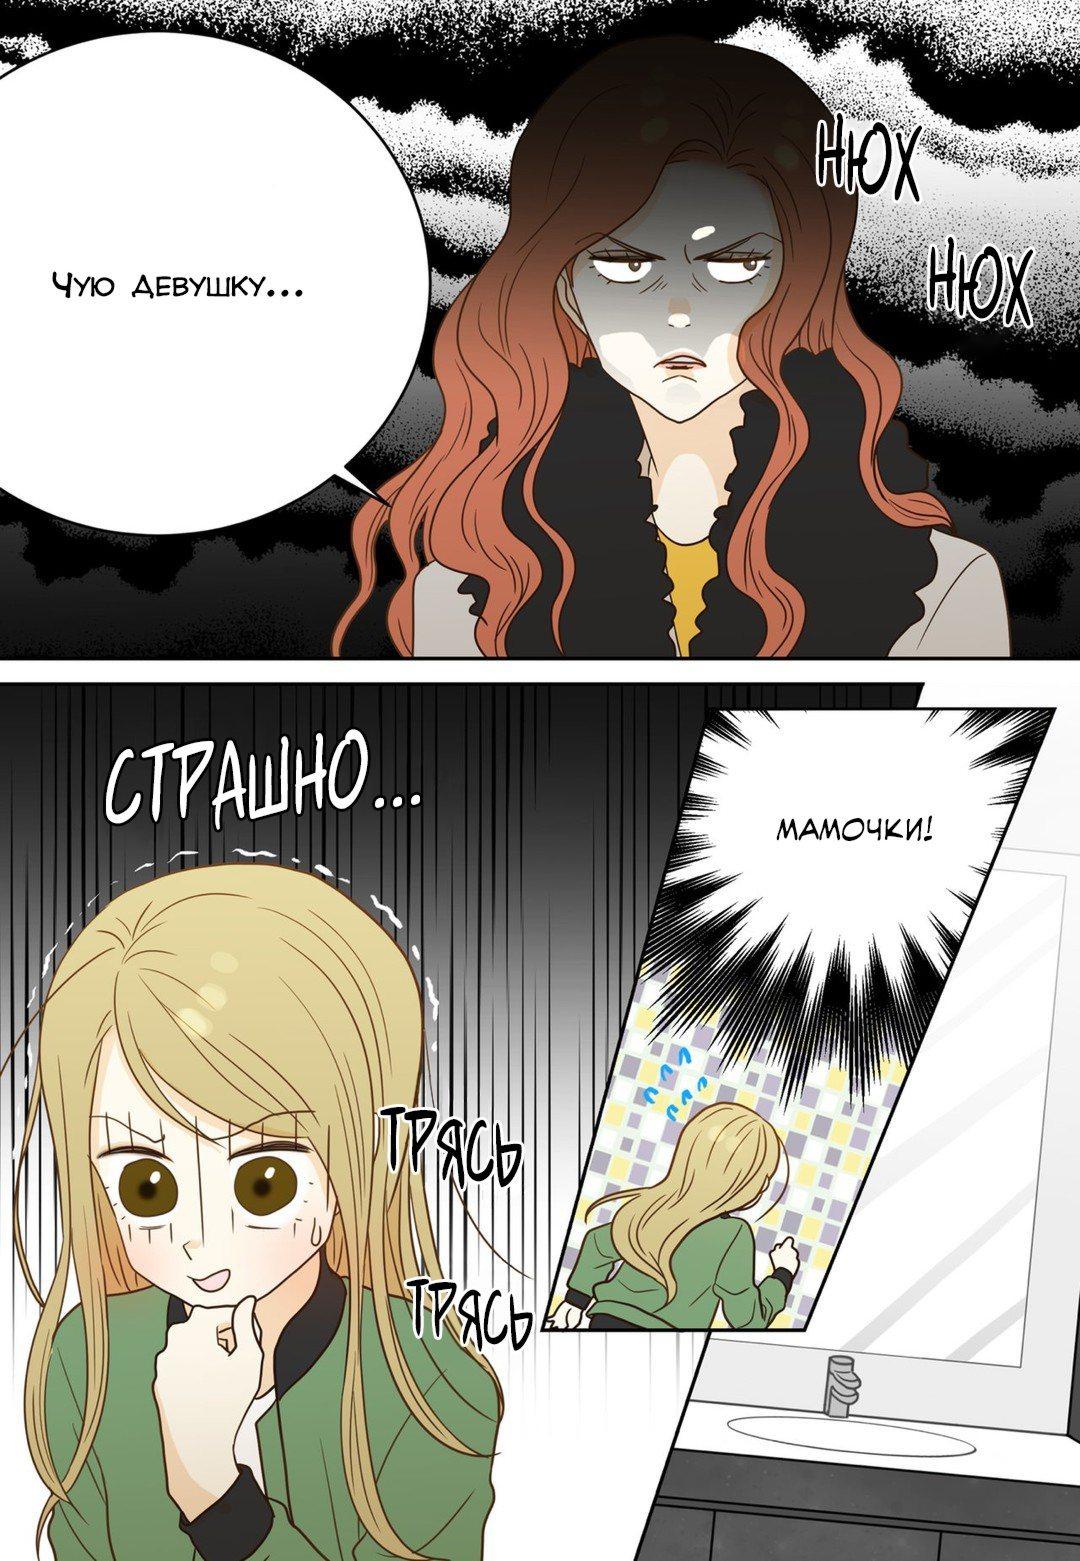 https://r1.ninemanga.com/comics/pic3/46/33774/1323252/1552615707779.jpg Page 3